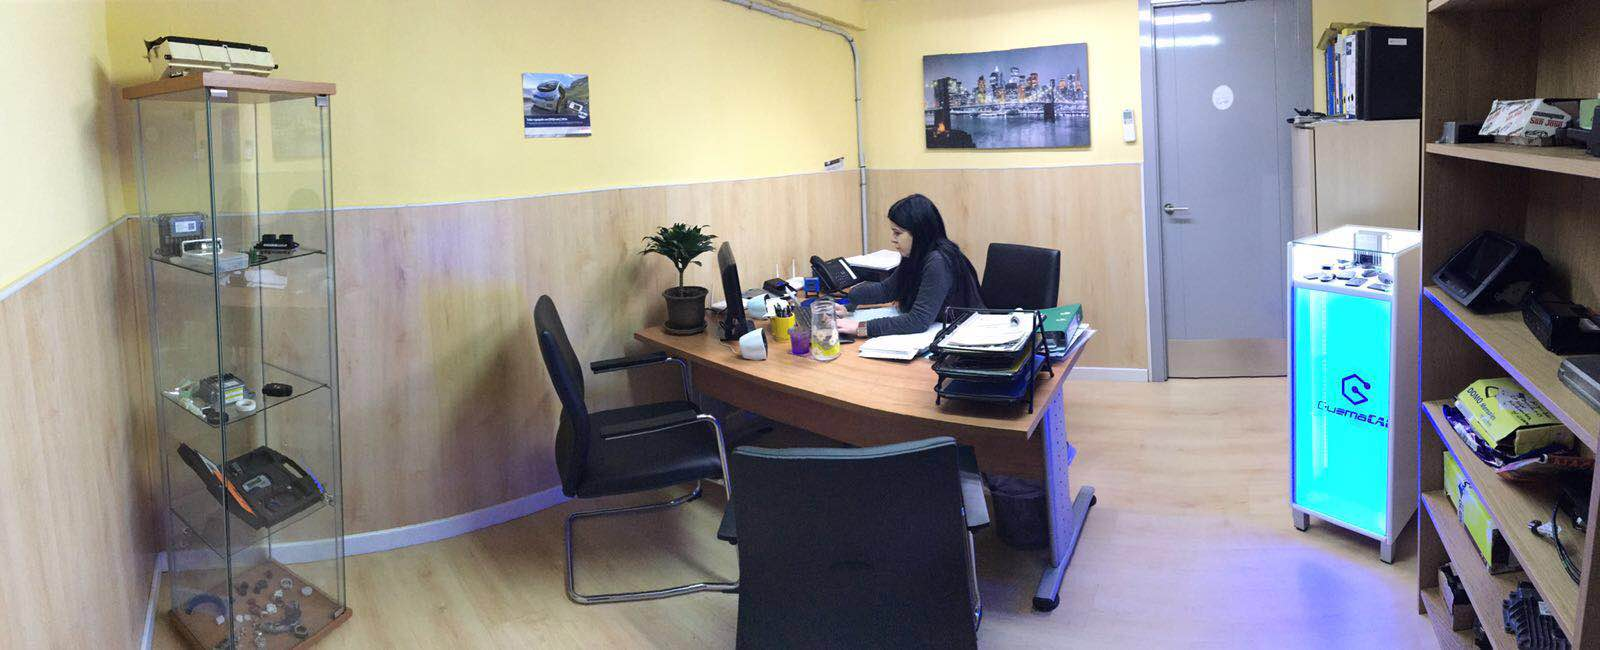 Oficina Guemacar